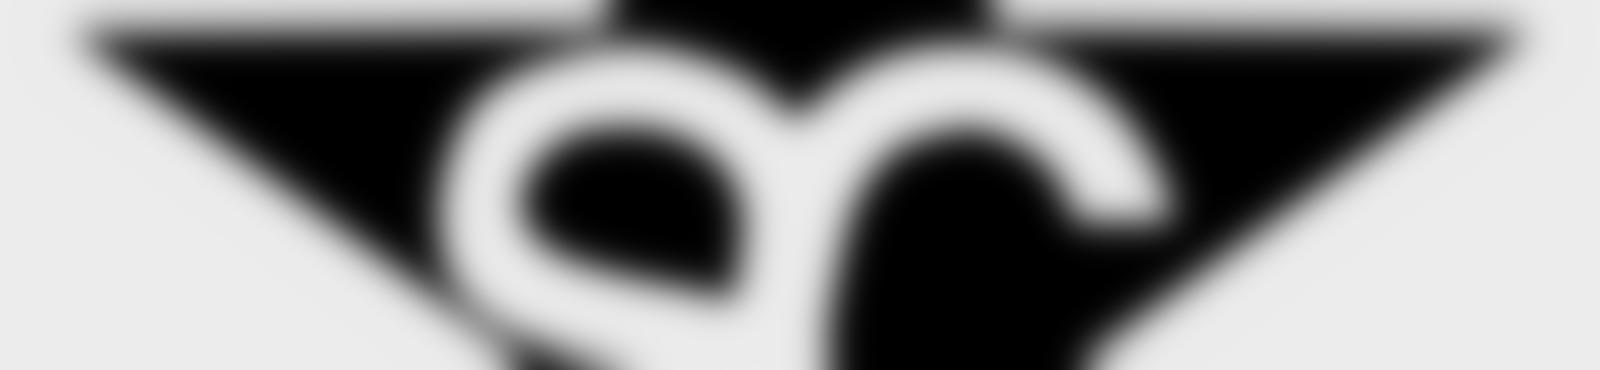 Blurred 23b5ce67 30b8 4314 a9a9 cf8f9eb2000a